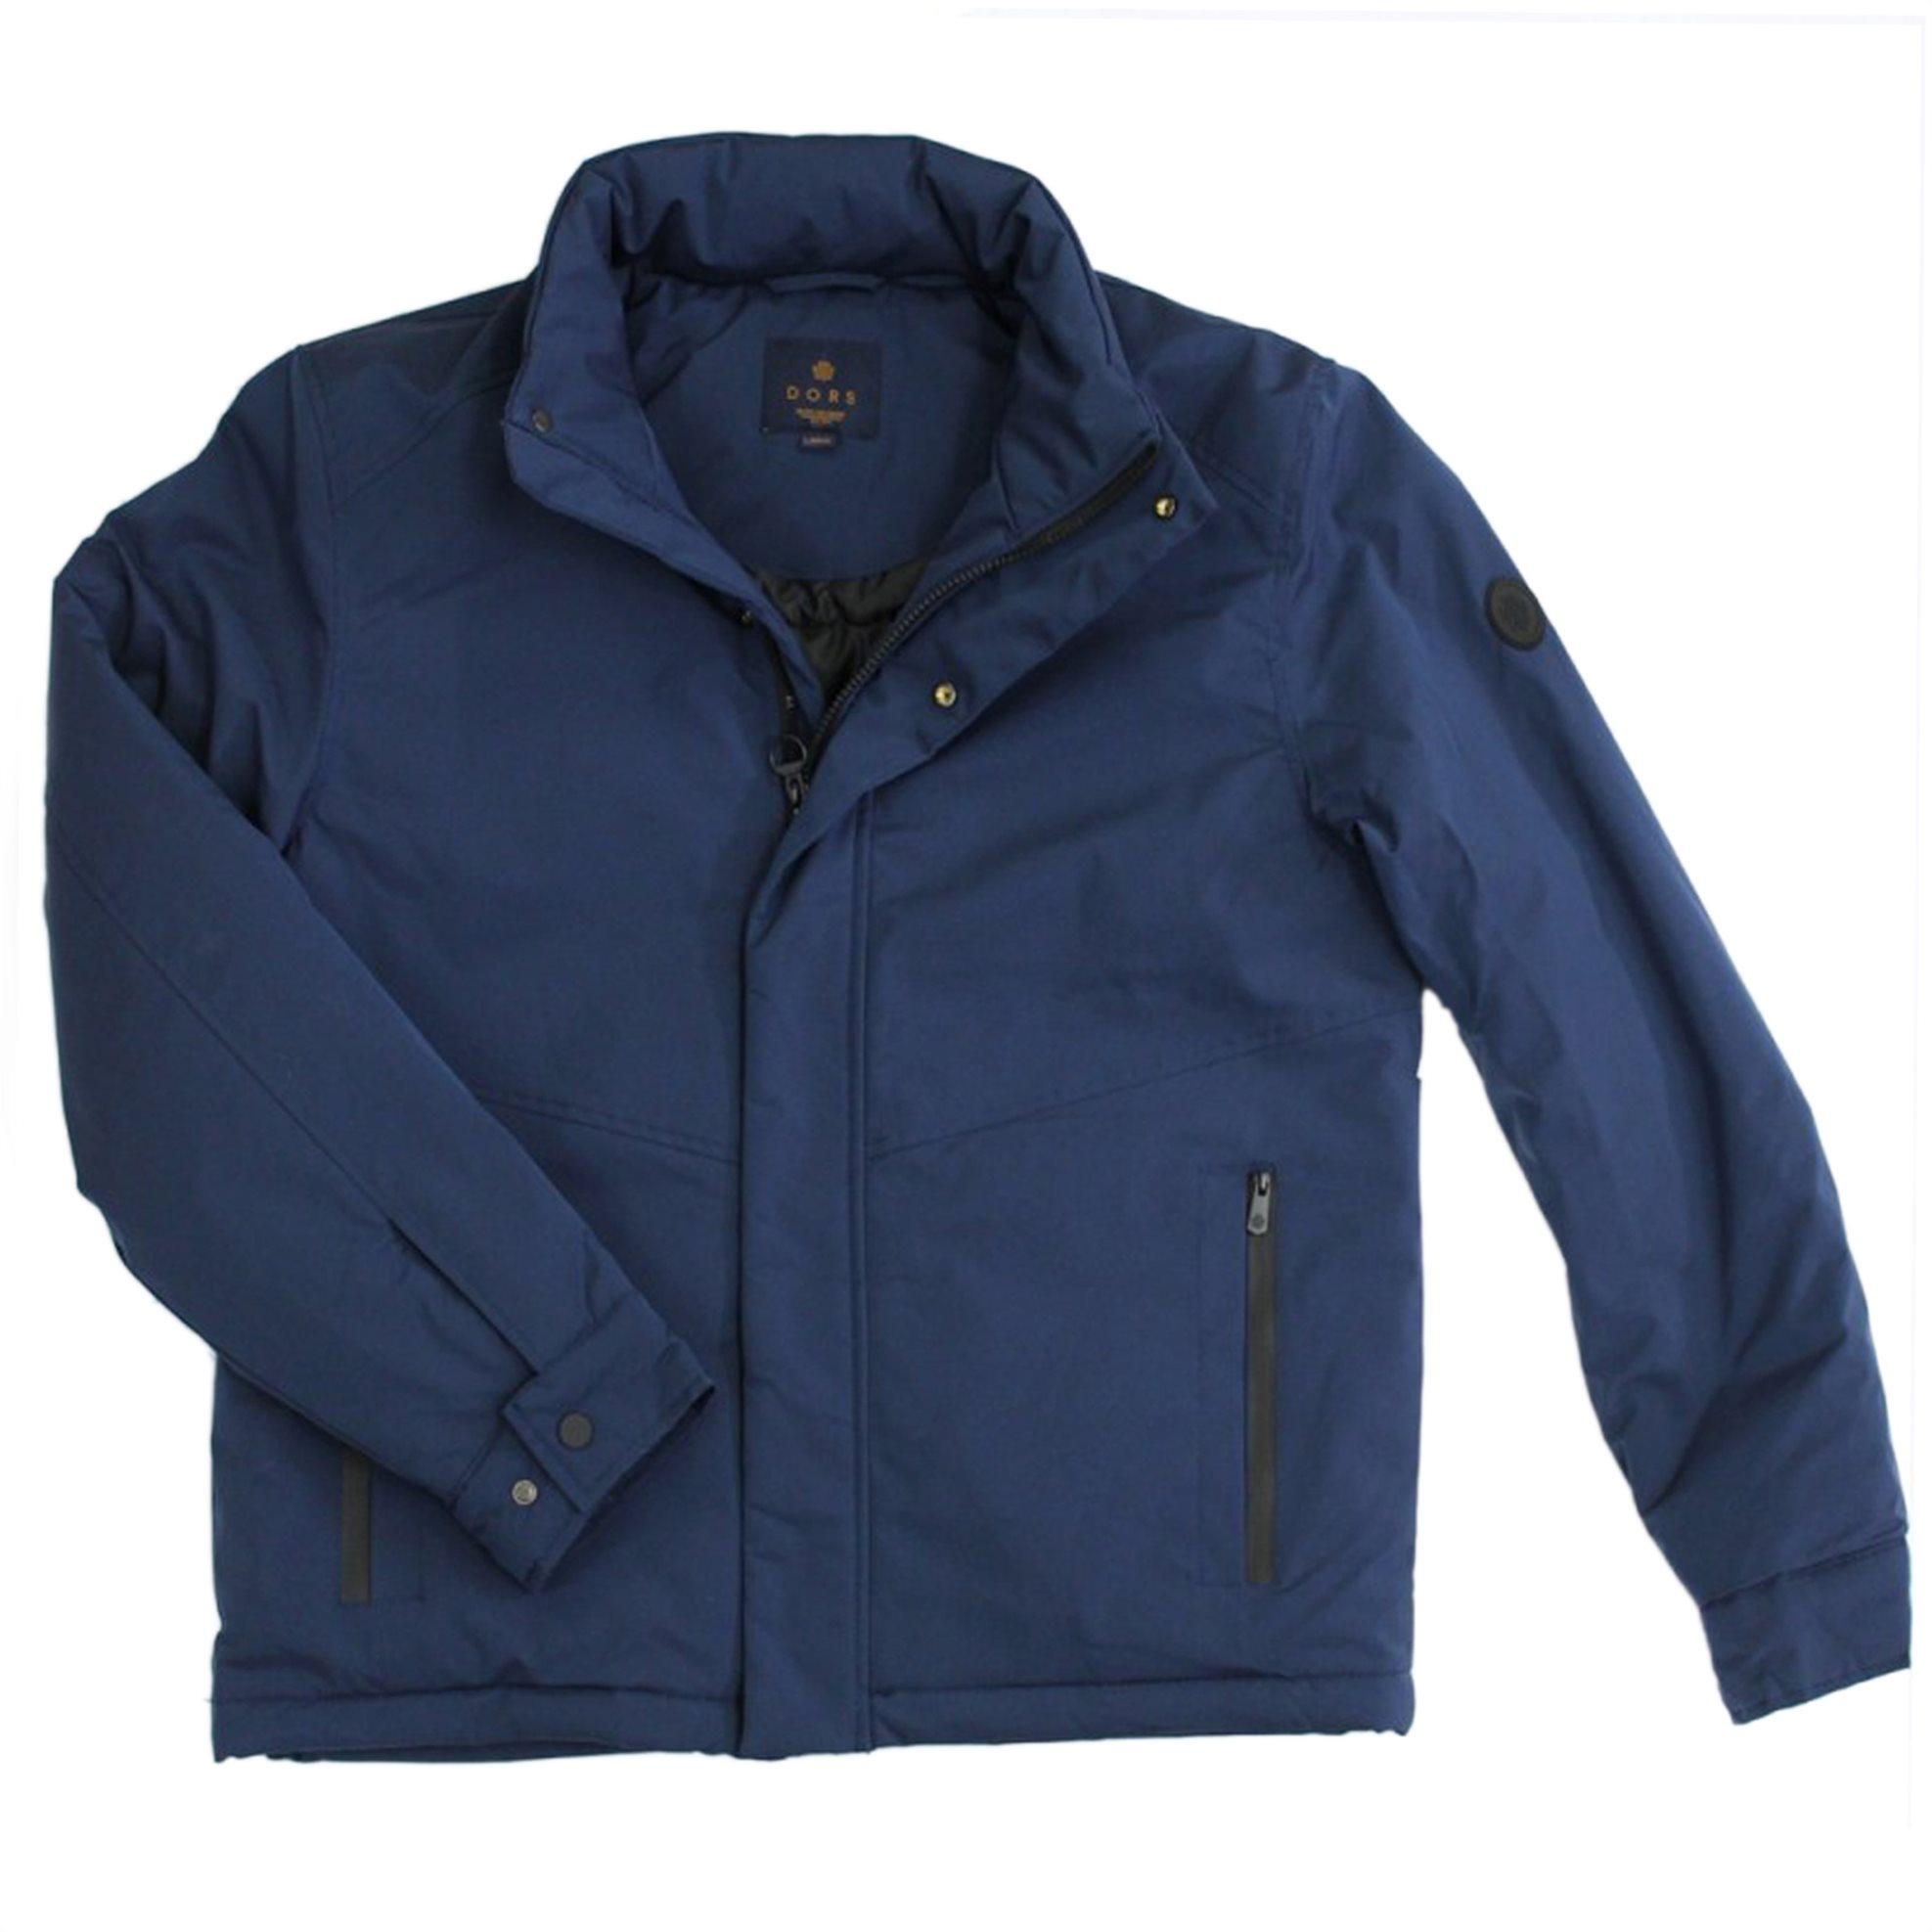 DORS ανδρικό αδιάβροχο μπουφάν με ψηλό γιακά - 3029003.C01 - Μπλε